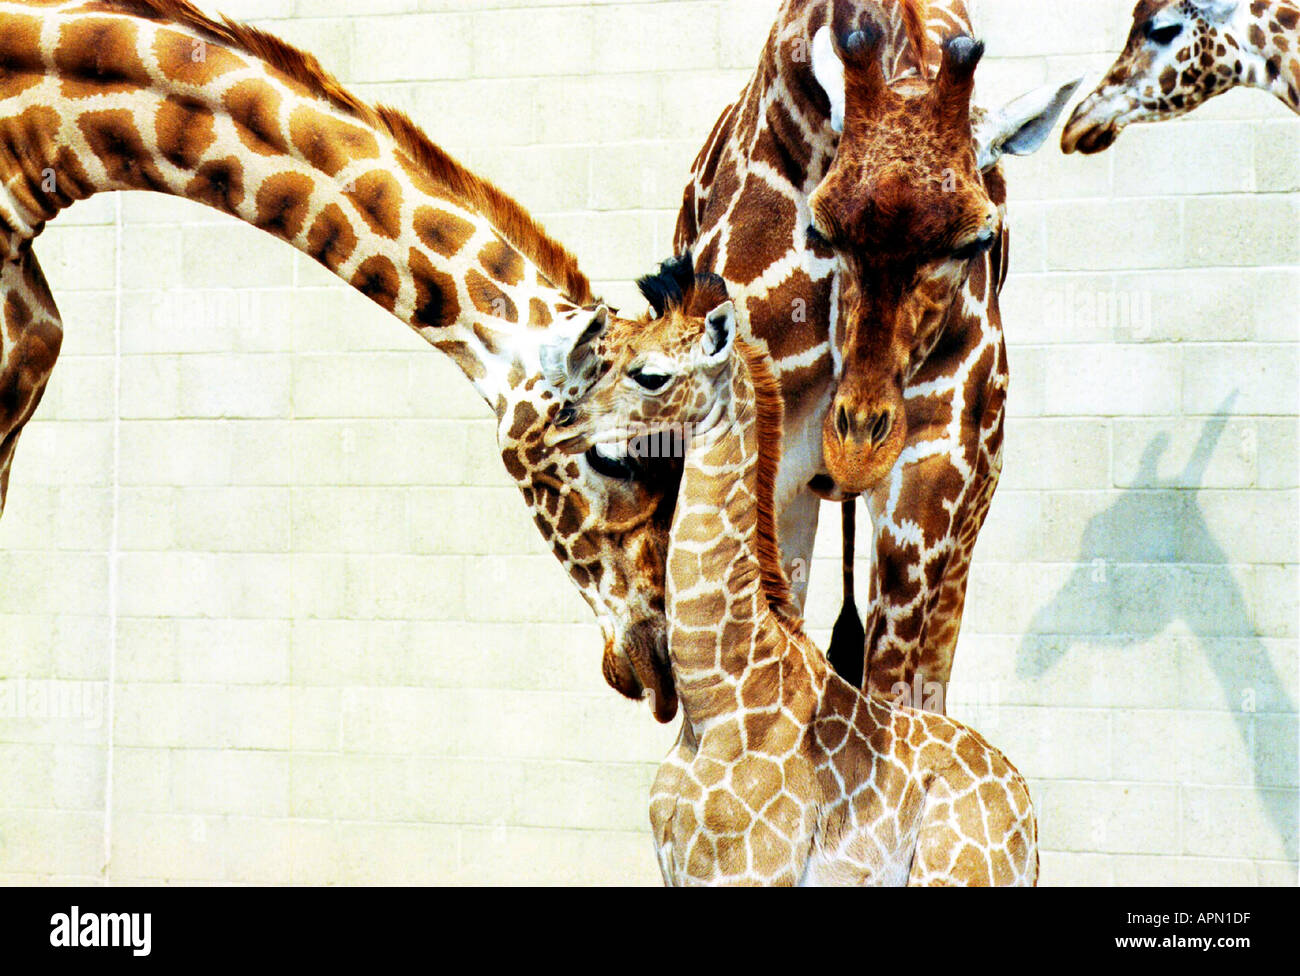 Bebé jirafa con su familia Imagen De Stock